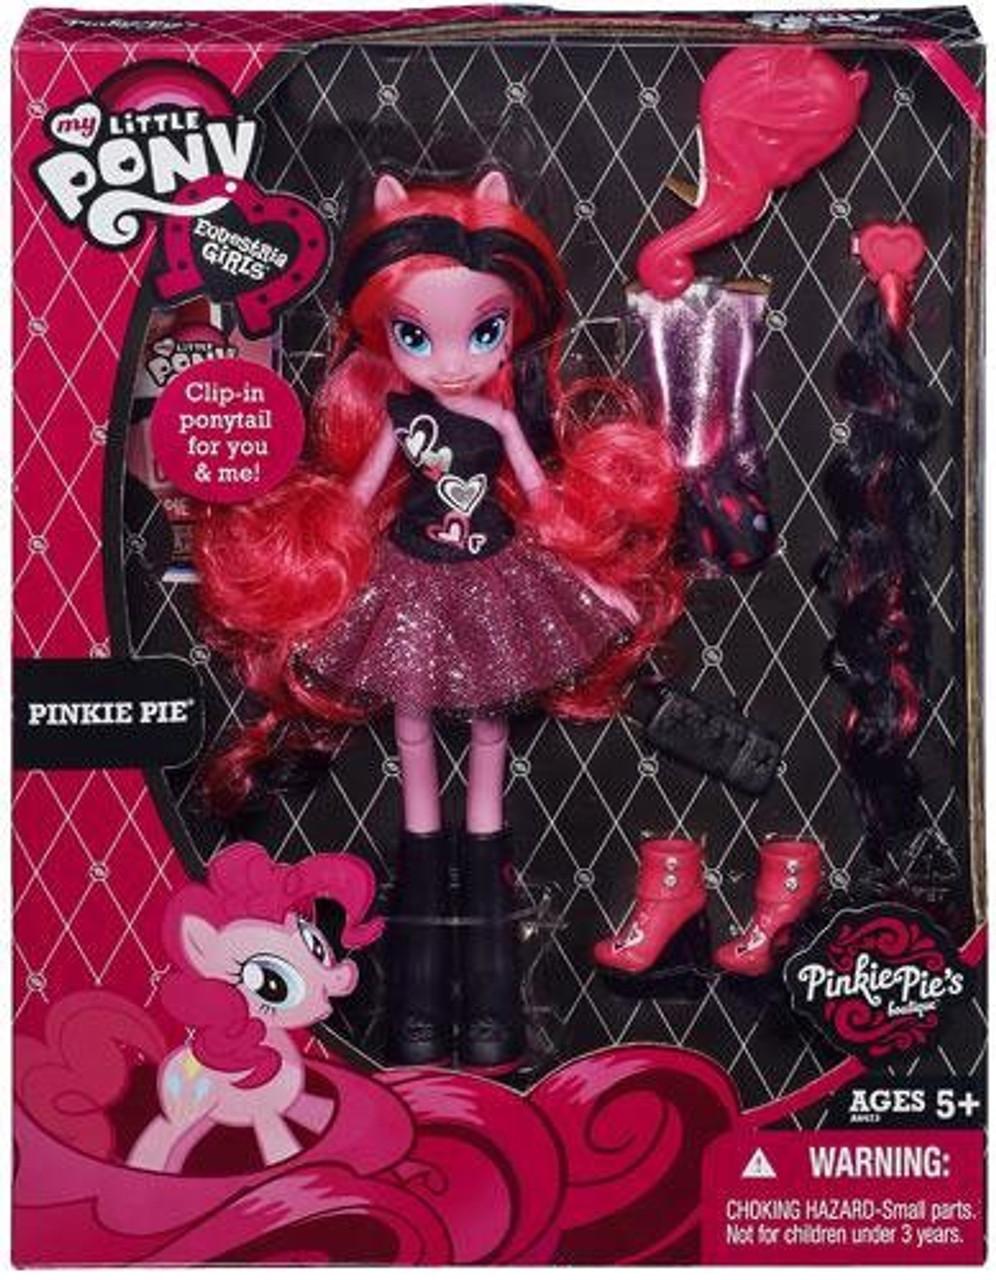 My Little Pony Equestria Girls Pinkie Pie's Boutique Pinkie Pie Exclusive 9-Inch Doll